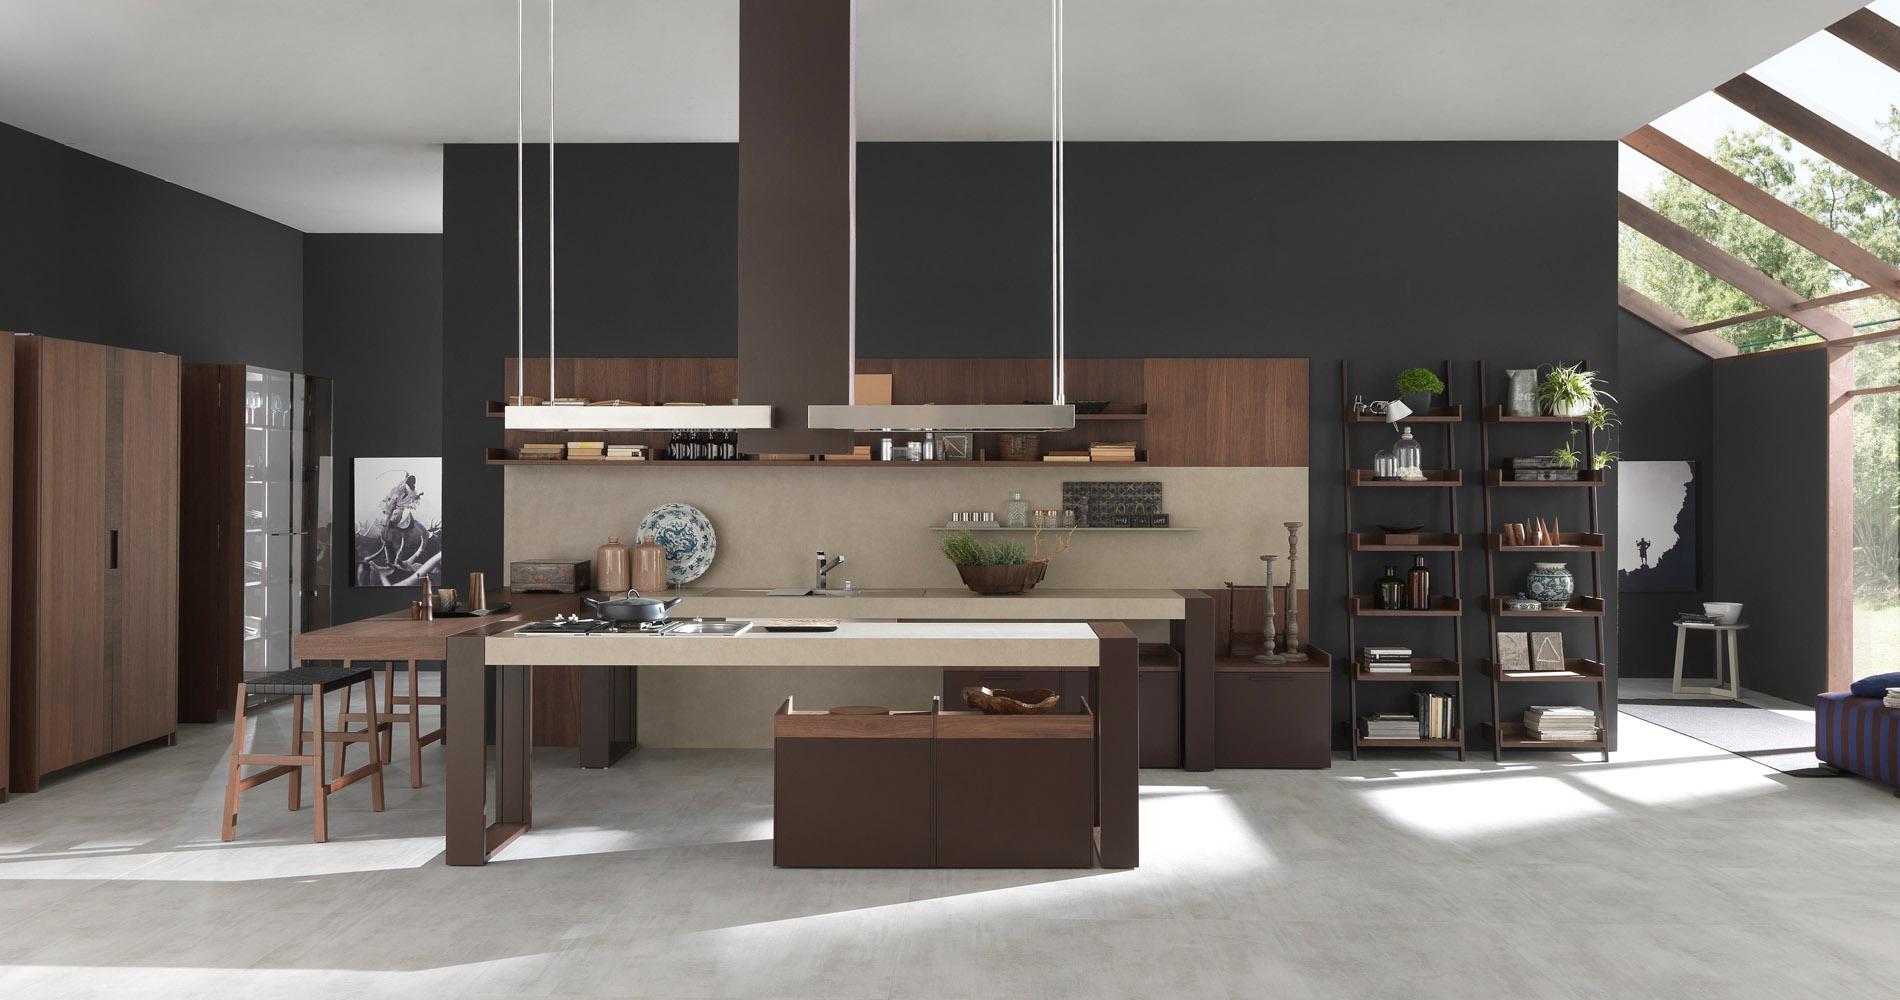 Kitchen Installation – Hire The Best Kitchen Company